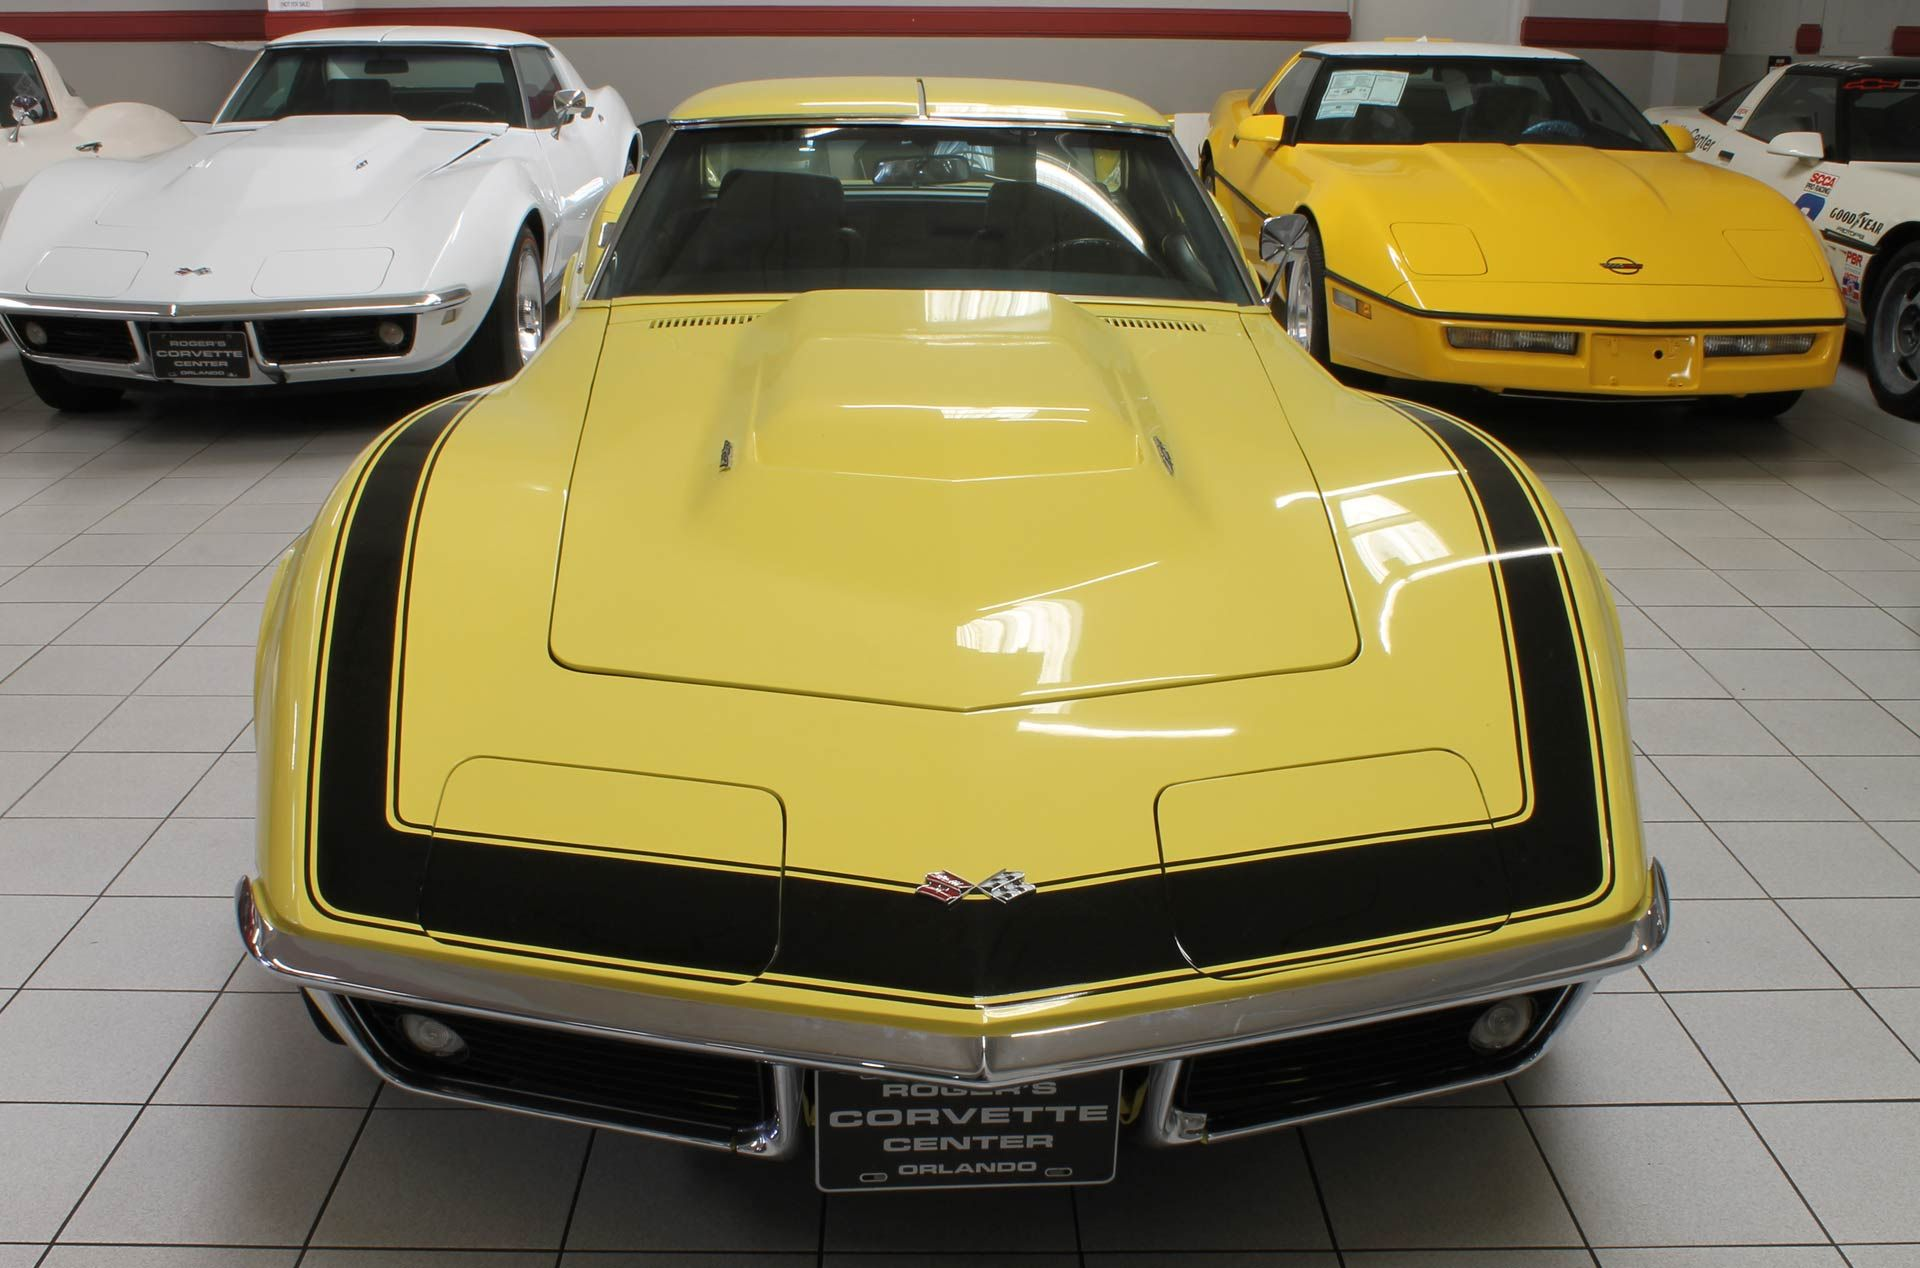 1969 Corvette ZL-1: The most collectible Corvette in history ...